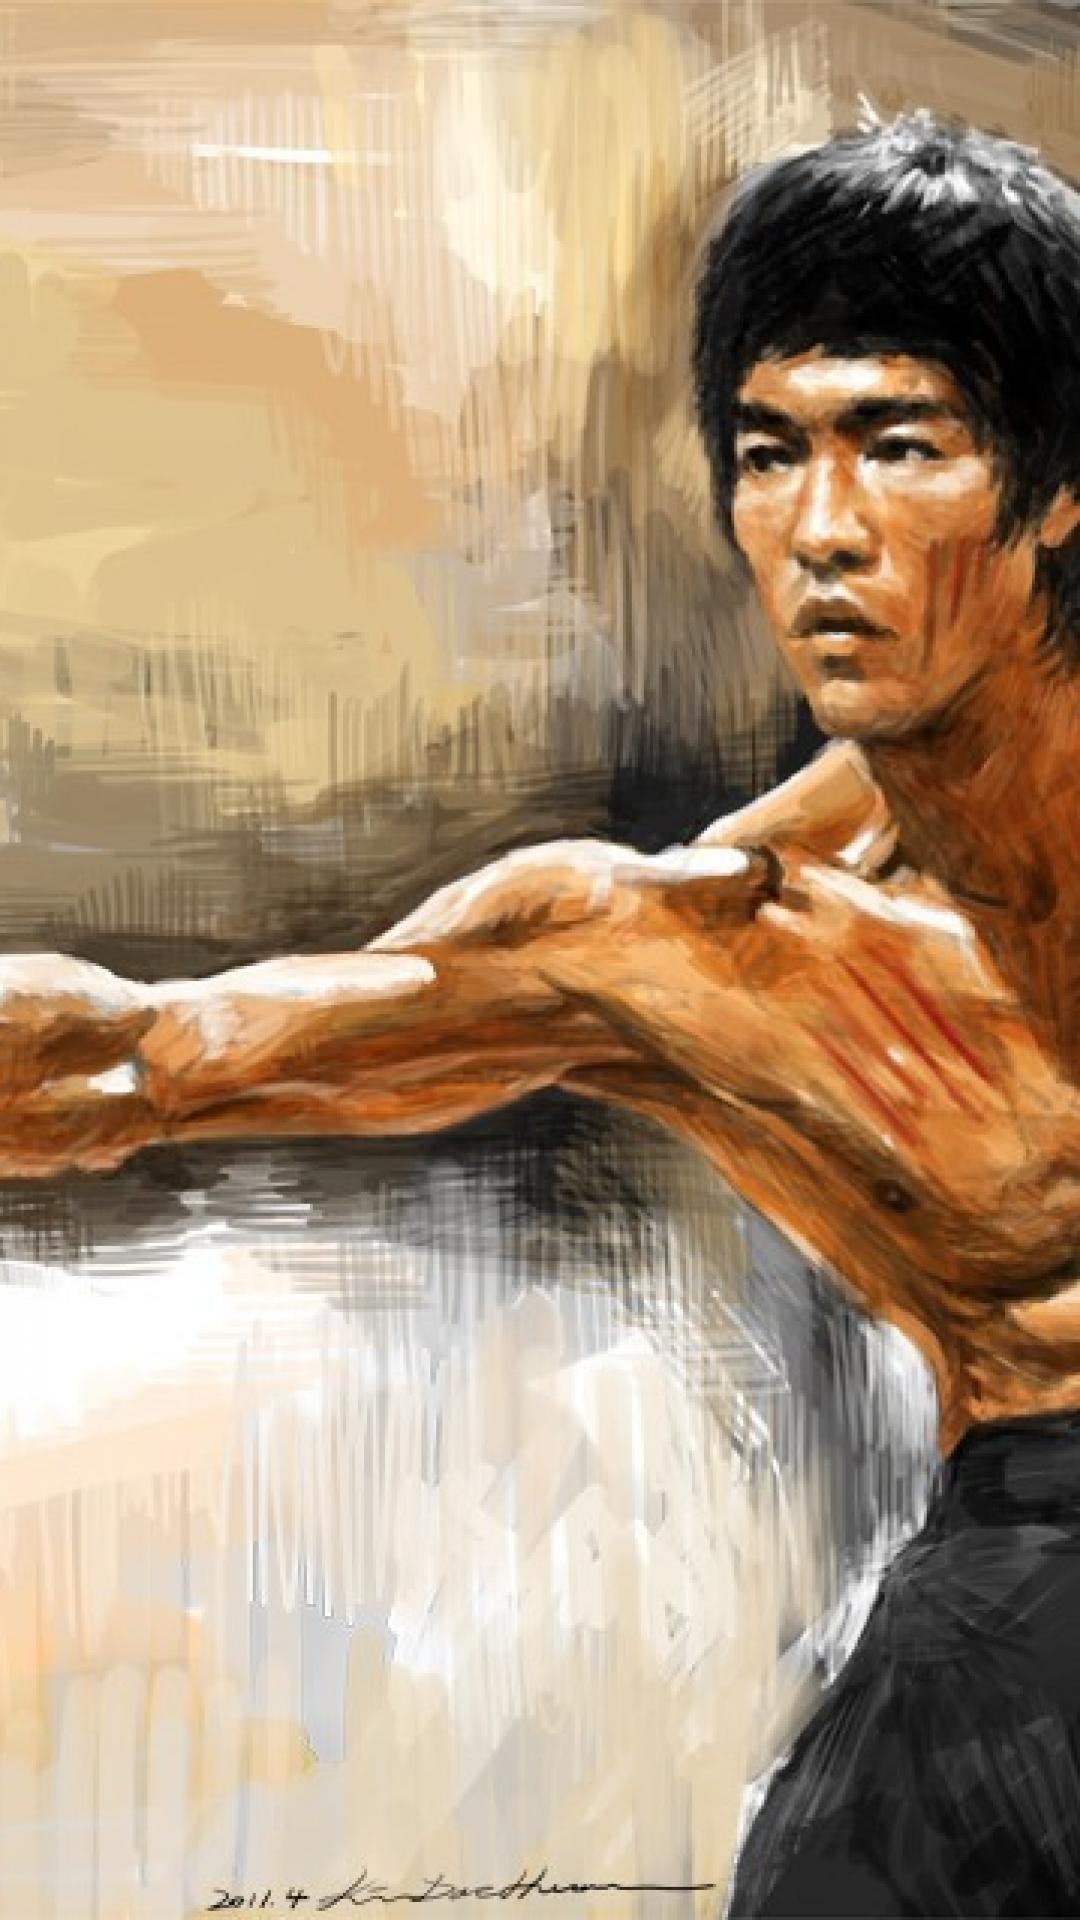 Chicago Wallpaper Iphone X Bruce Lee Iphone Backgrounds Hd Pixelstalk Net